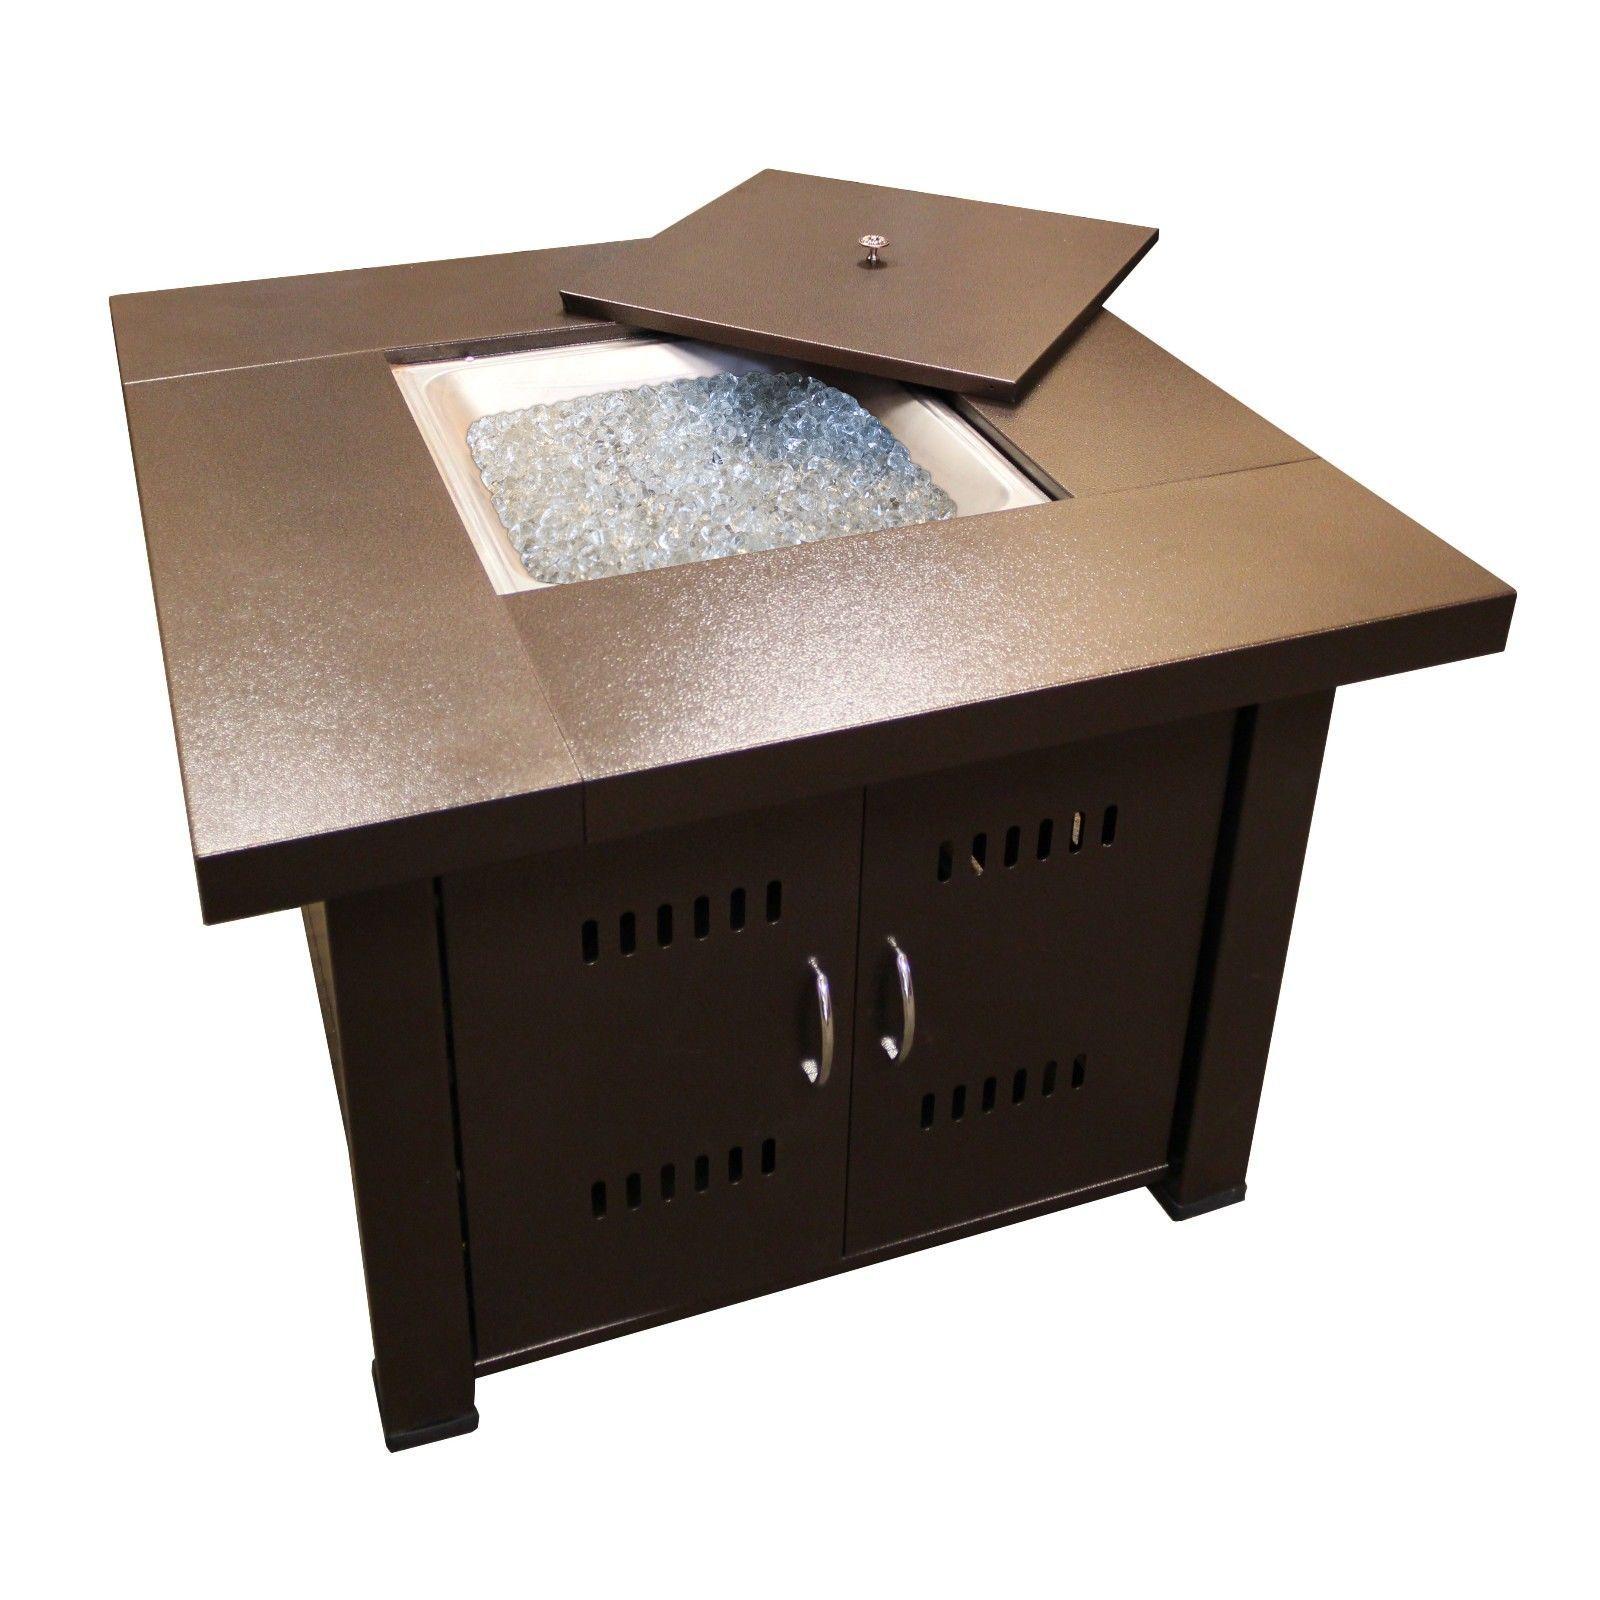 Propane Fire Pit Table Patio Gas Starter Fireglass Square Top  Butane Bronze